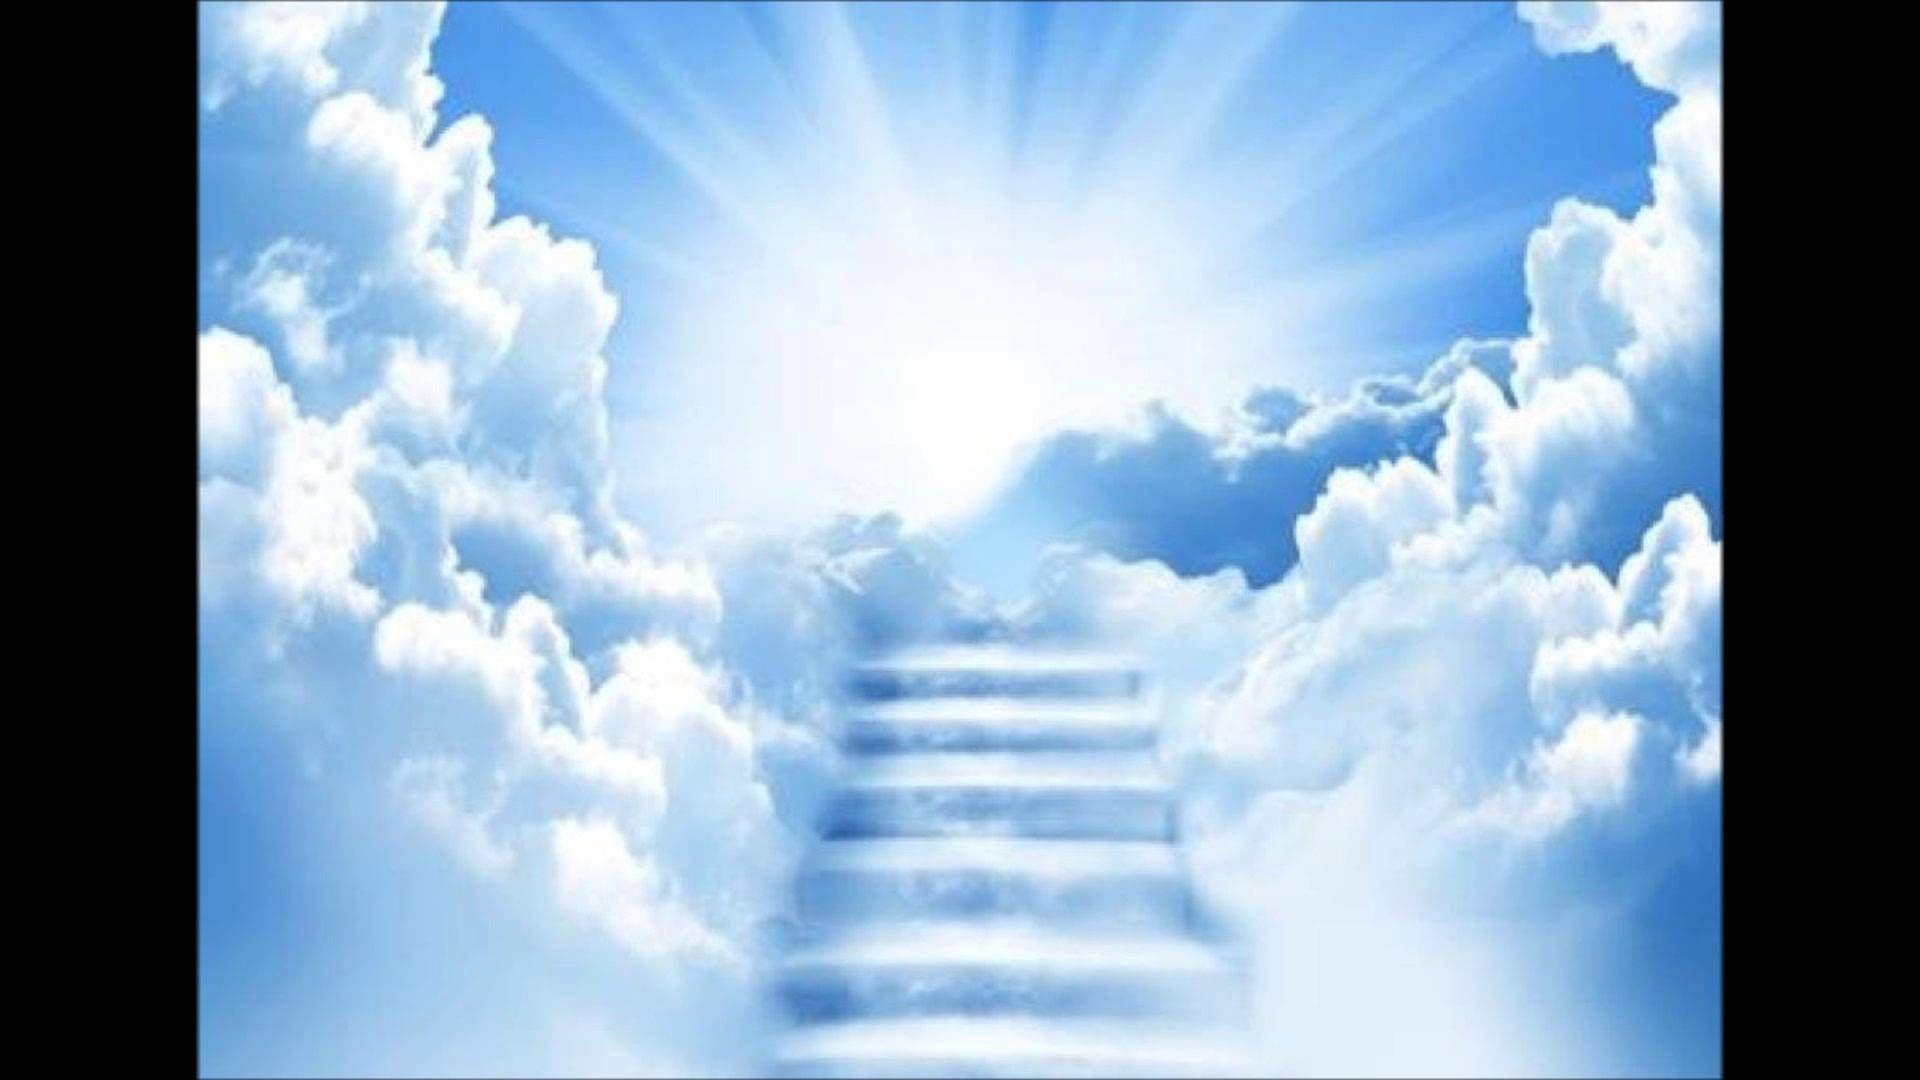 https://www.google.com.mx/search?q=cielo | Mensajes del cielo, Imagenes de  cielo, Fotos del cielo